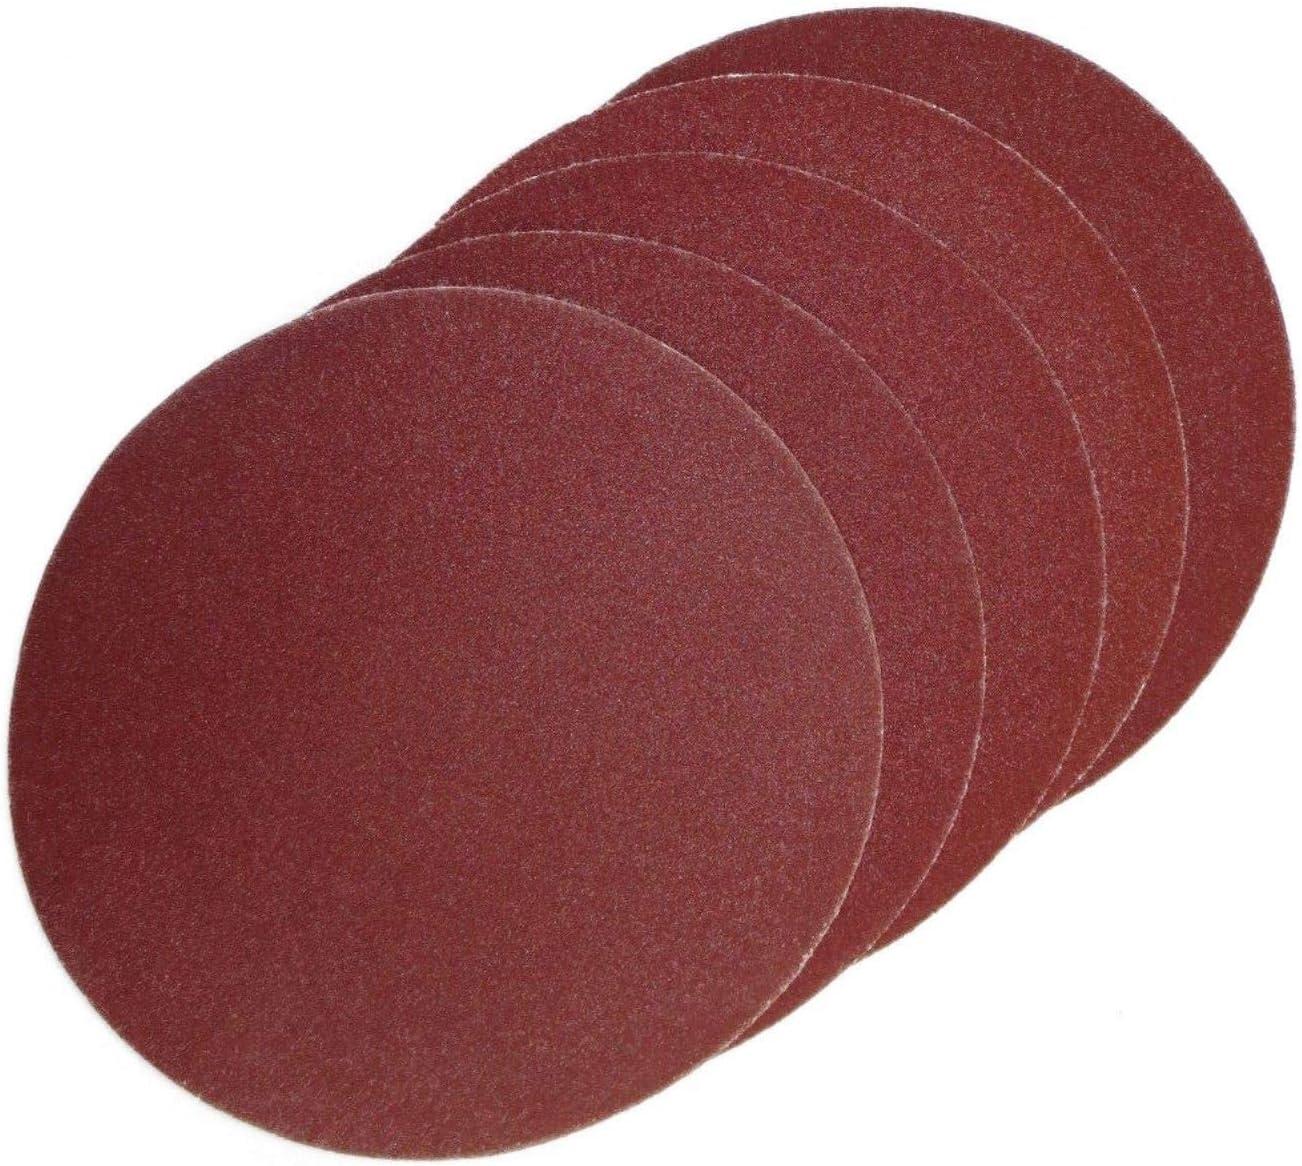 ECKRA 2868 50 Disques abrasifs adh/ésifs /Ø 125 mm sans trous daspiration P60 Marron rouge